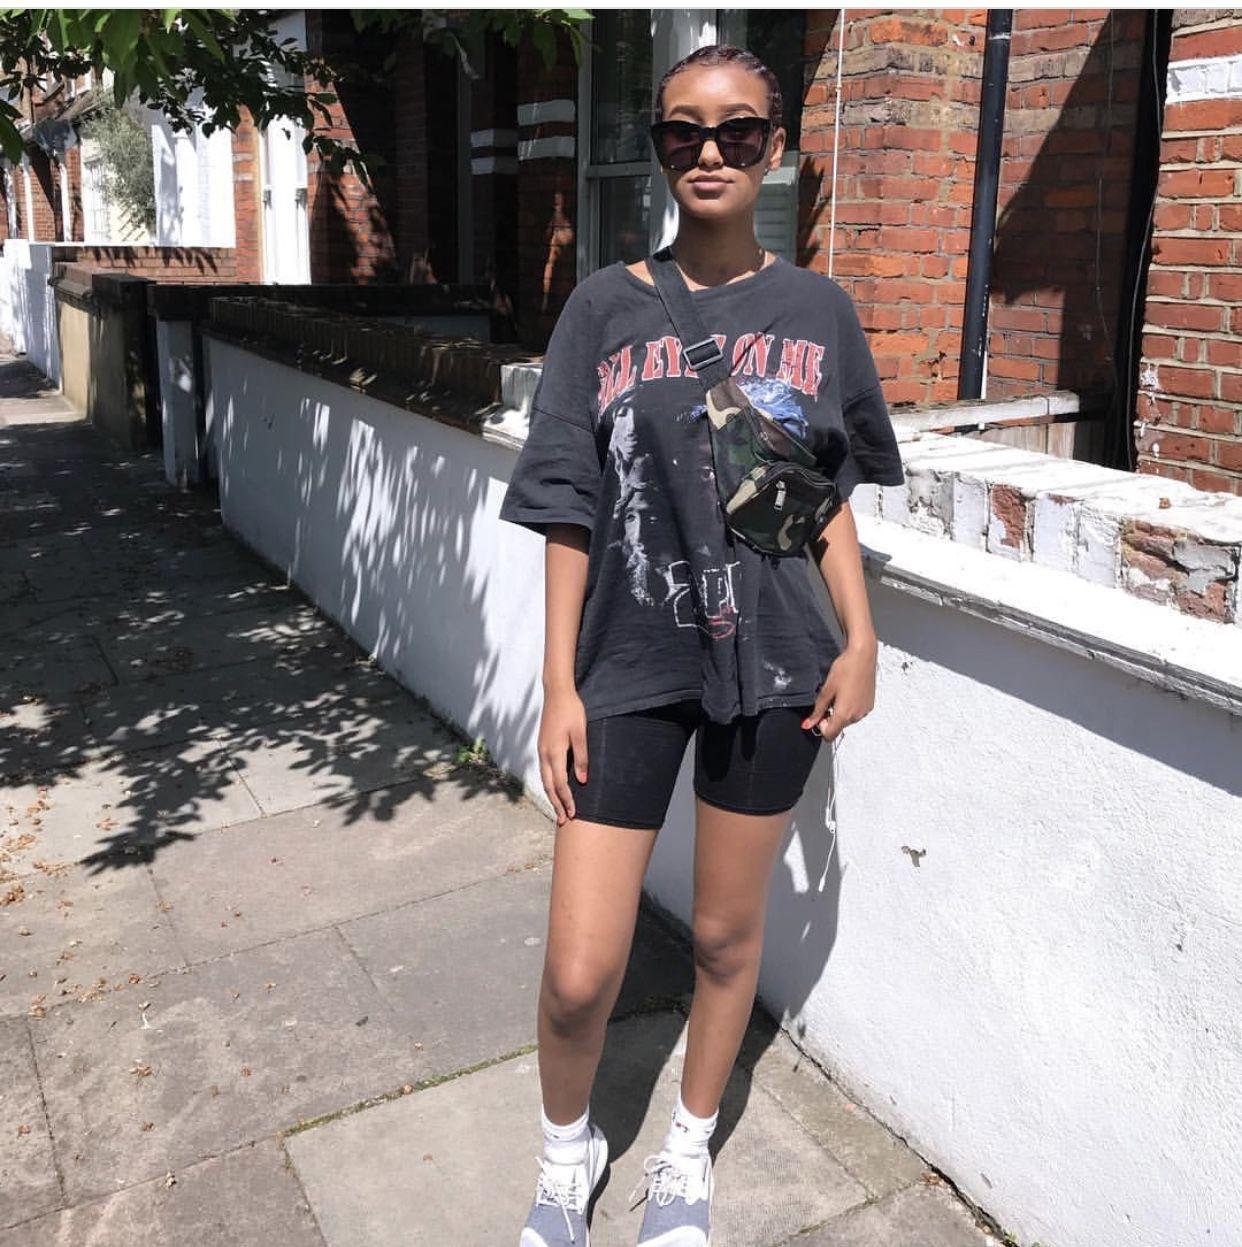 baggy band tee, biking shorts, dad shoes, belt bag, sunglasses fashion  NYC street style streetstyle streetwear